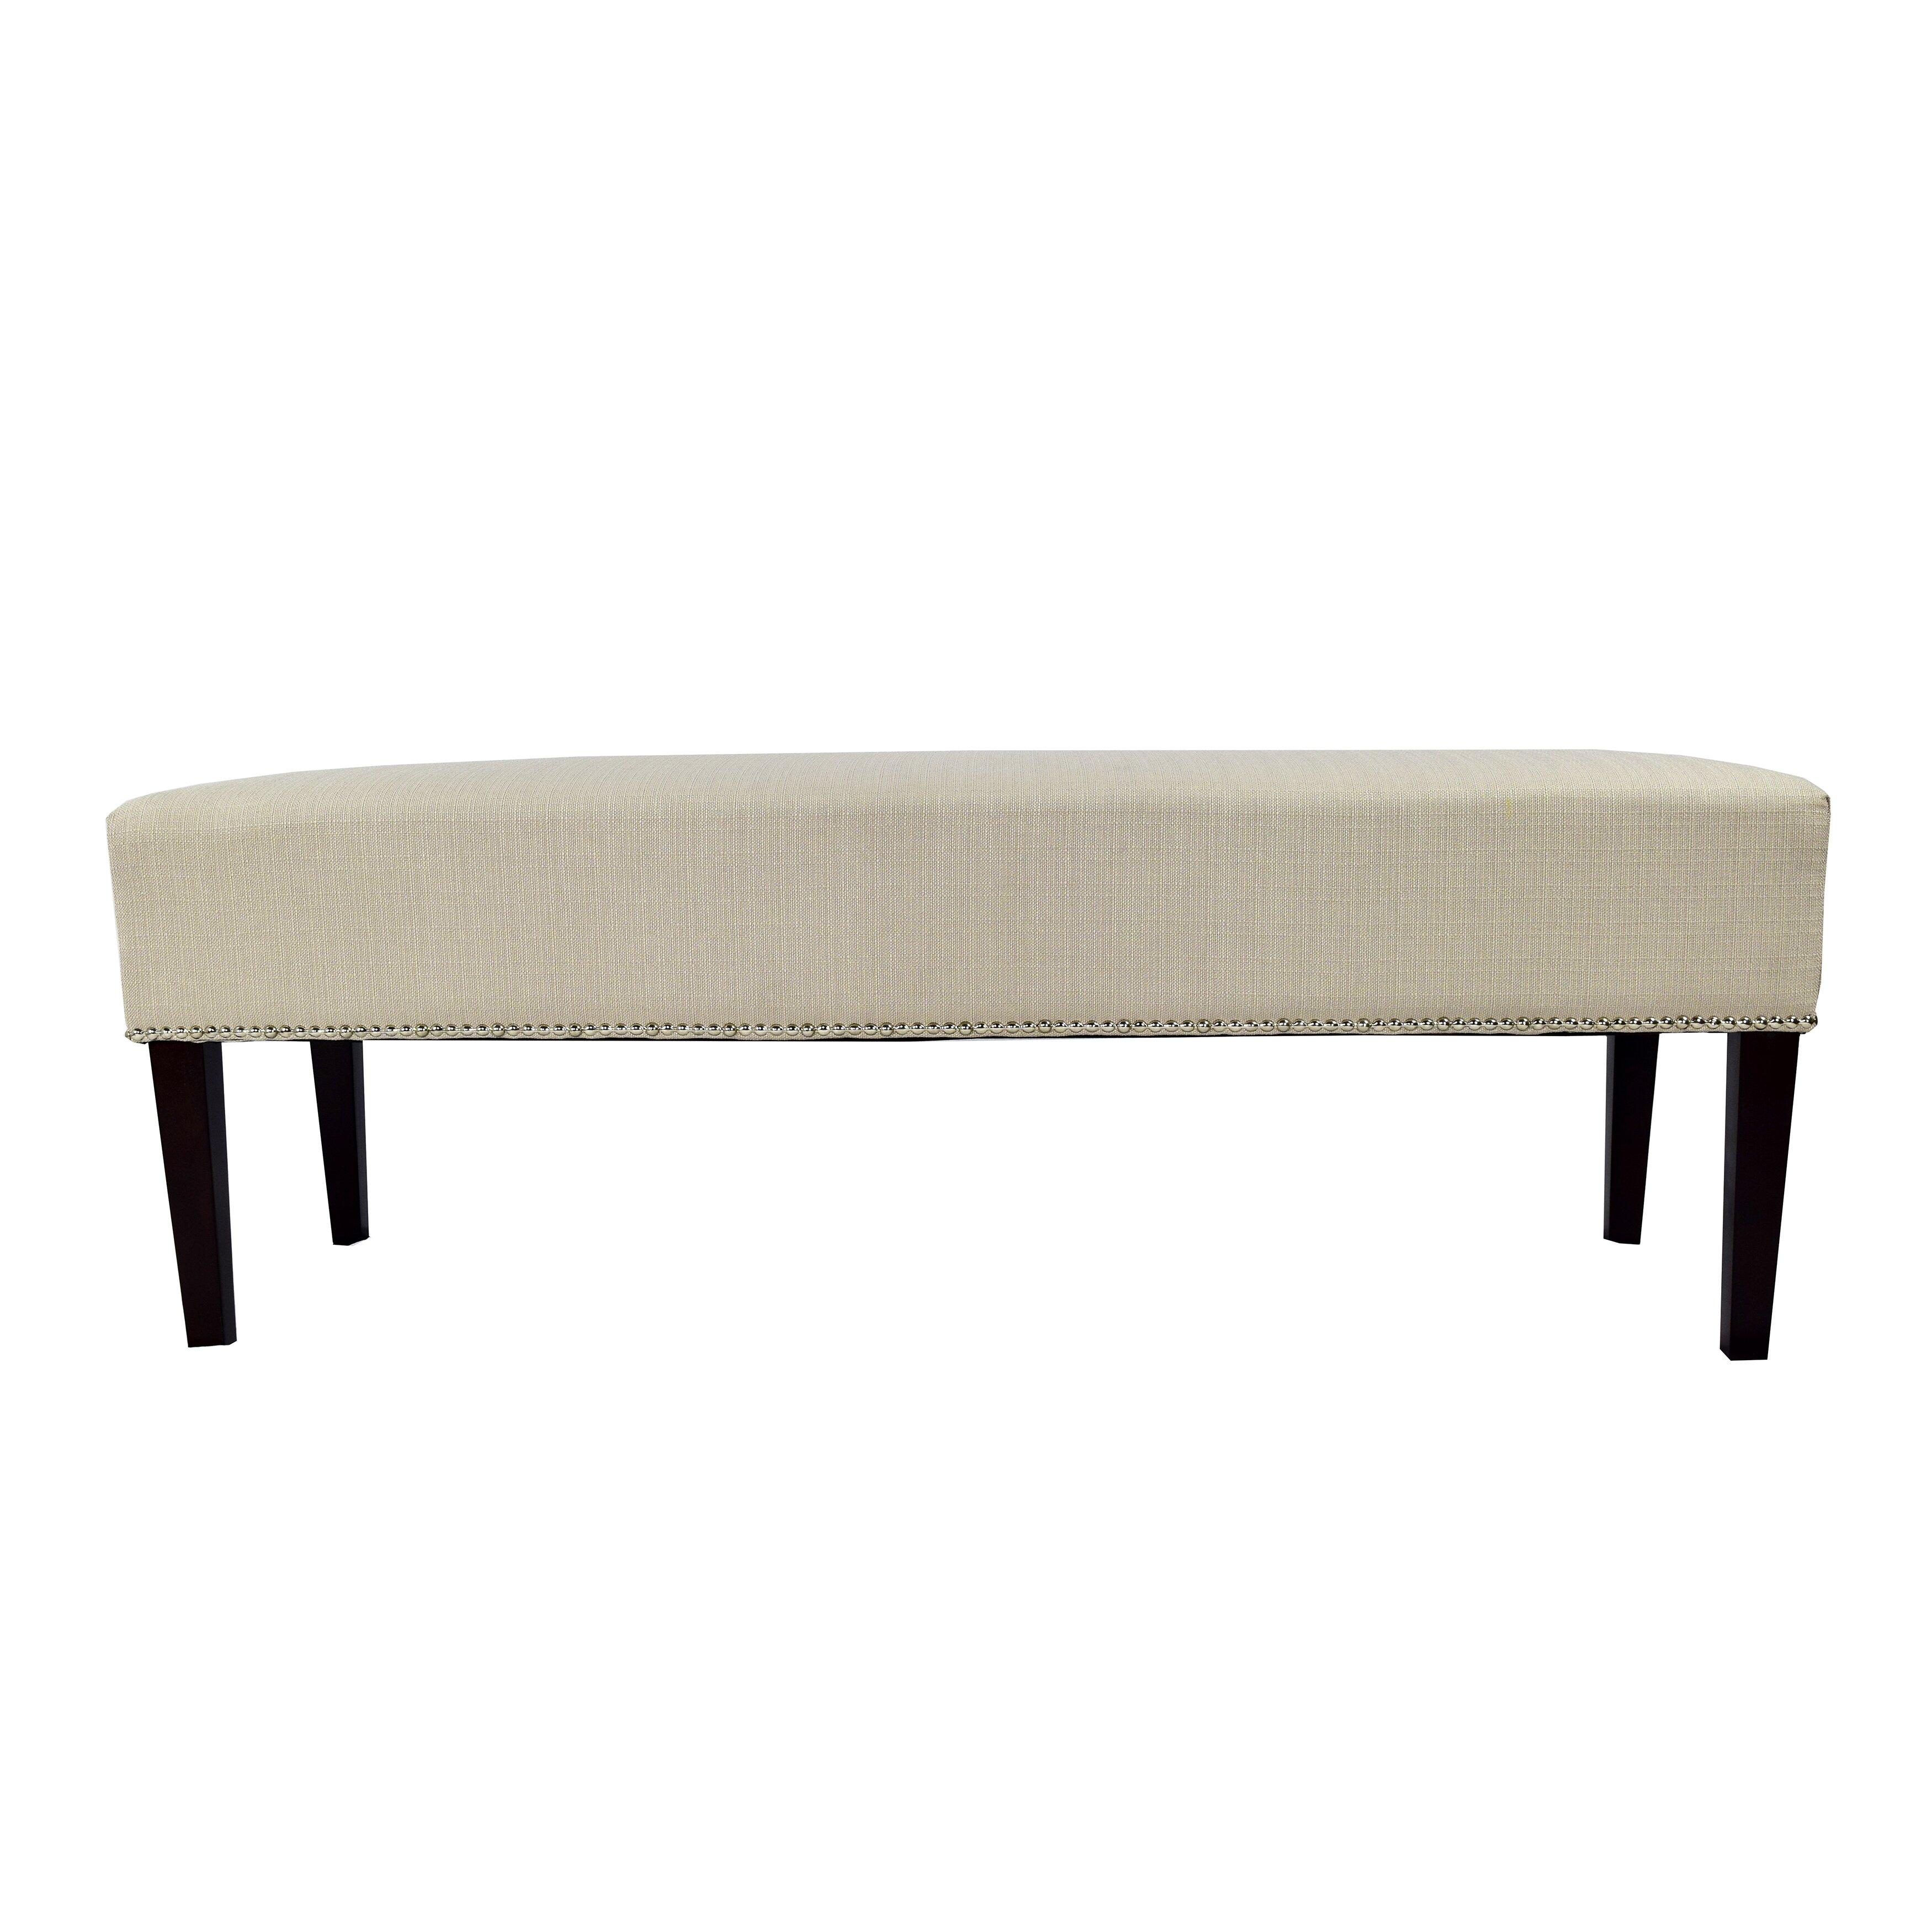 mjlfurniture roxanne upholstered bedroom bench reviews